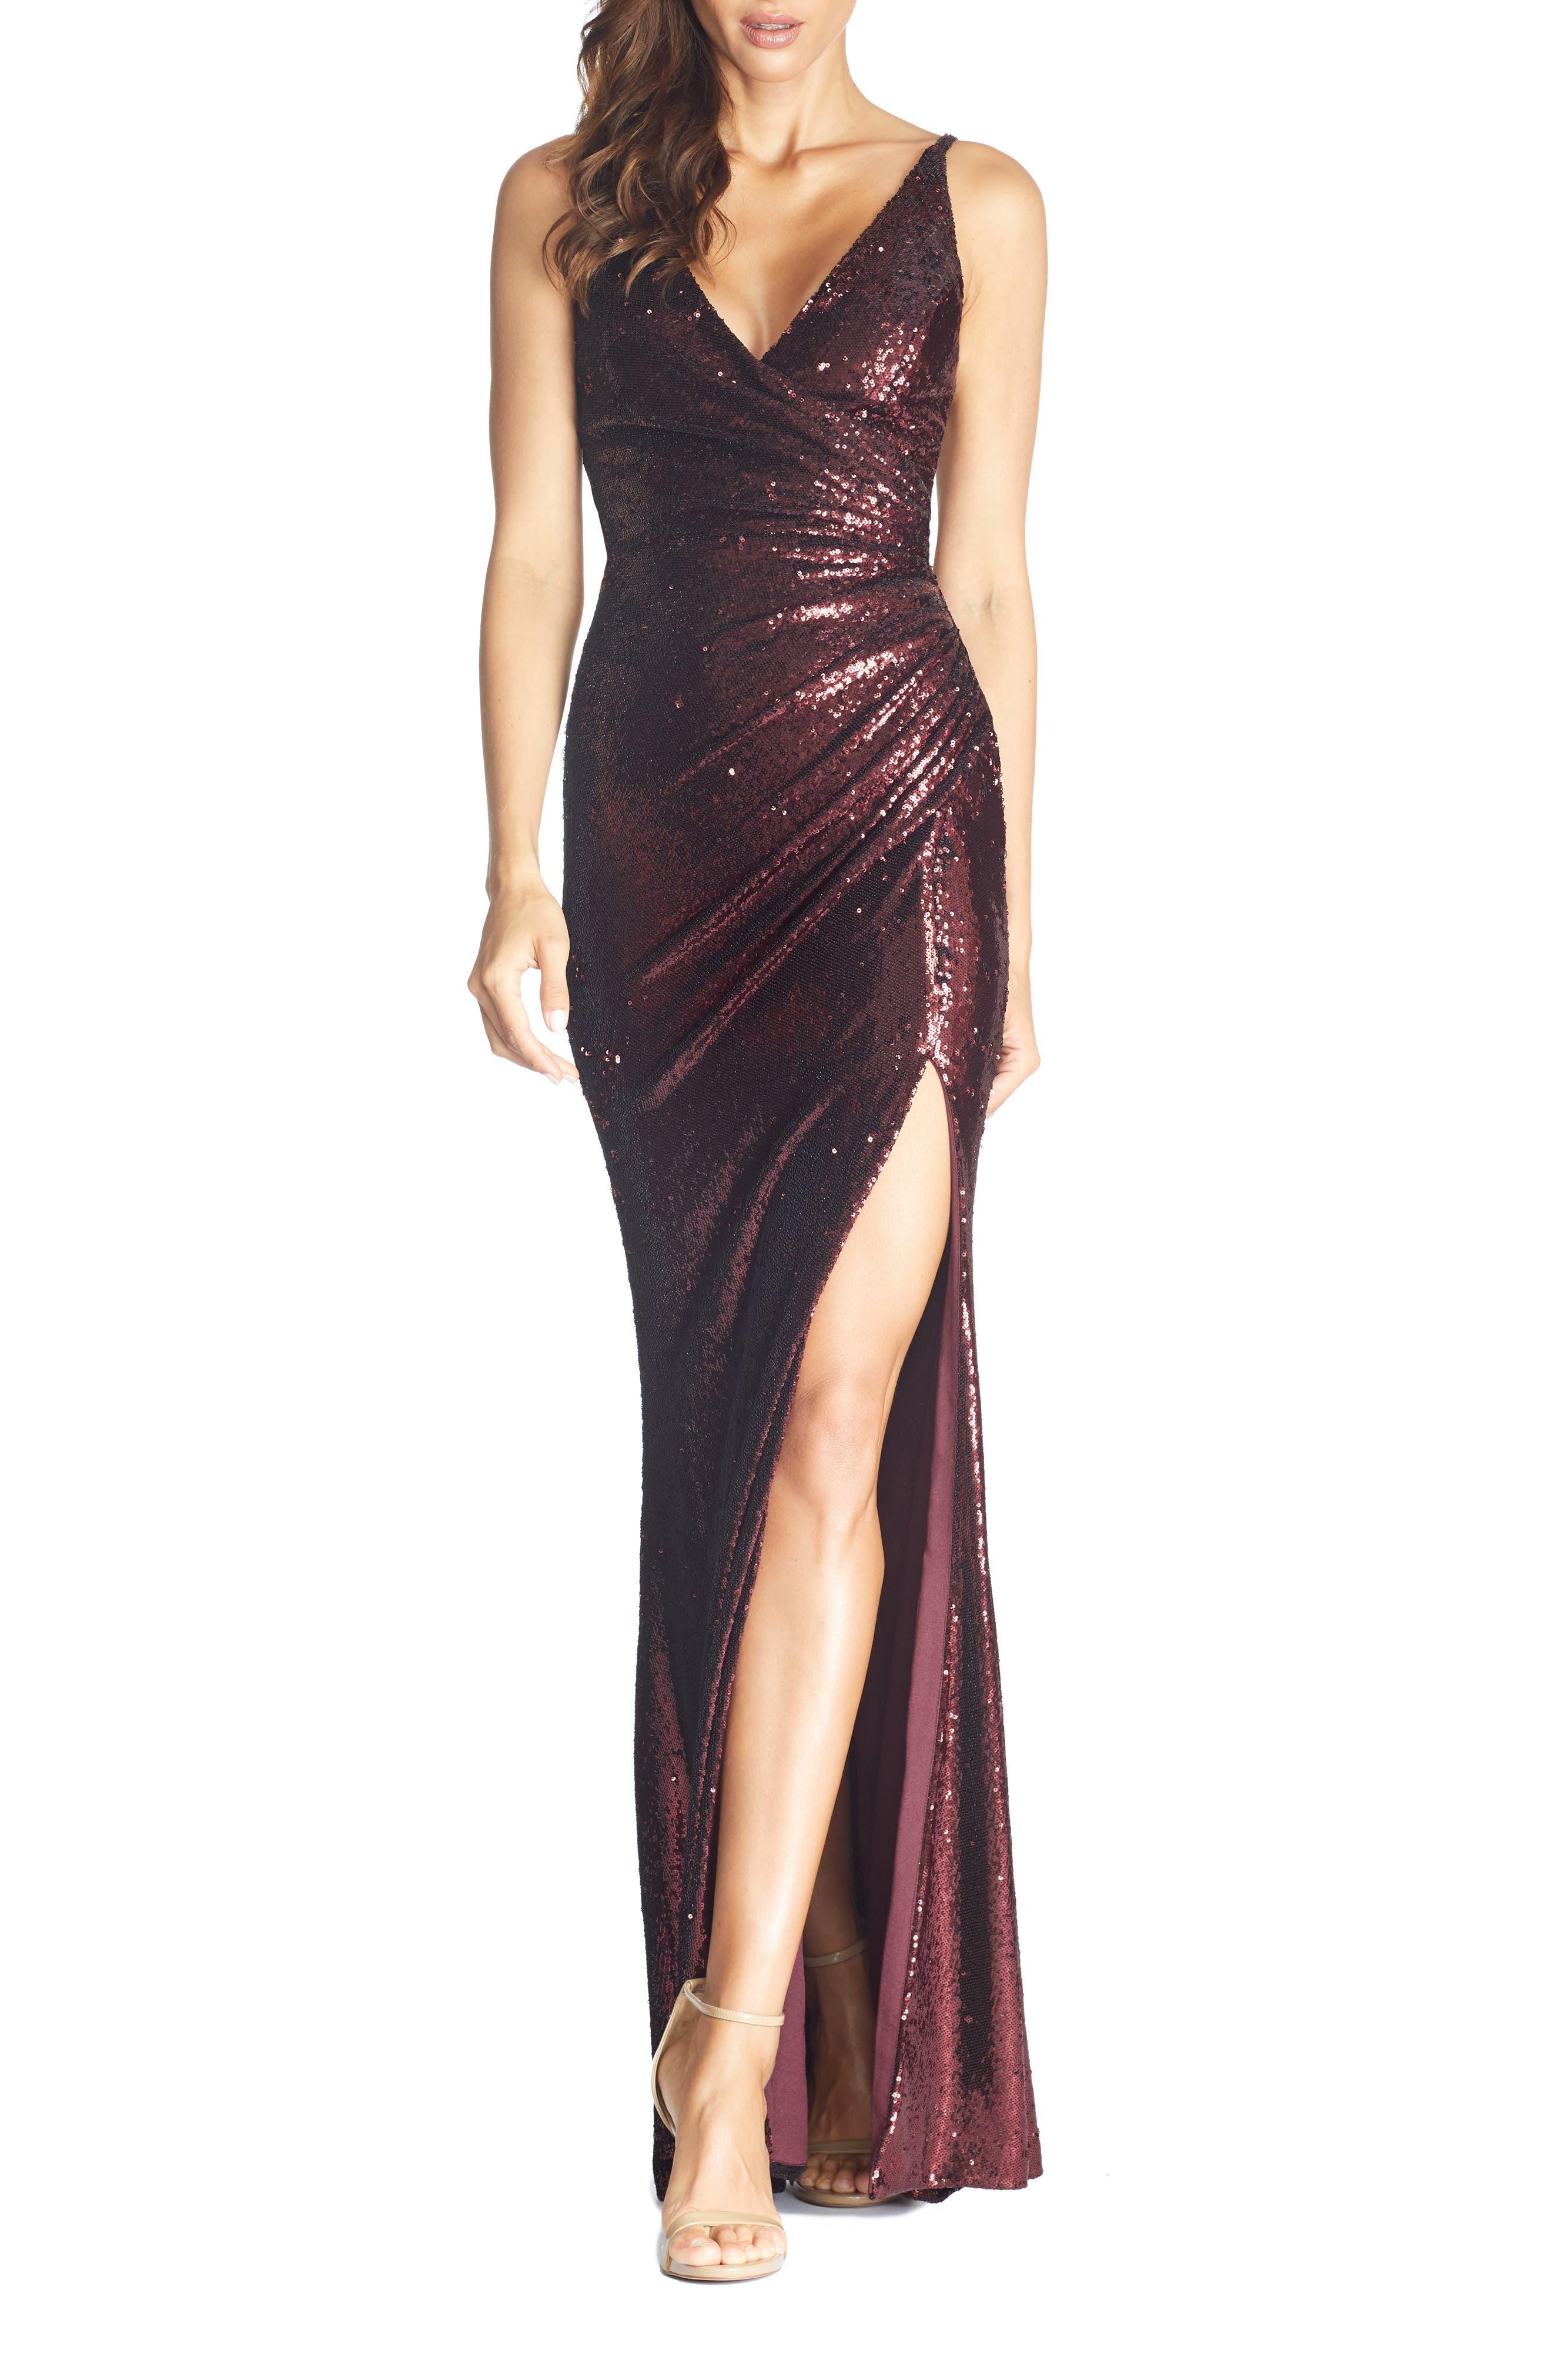 70s Dresses – Disco Dress, Hippie Dress, Wrap Dress Womens Dress The Population Jordan Ruched Mermaid Gown Size X-Large - Red $348.00 AT vintagedancer.com